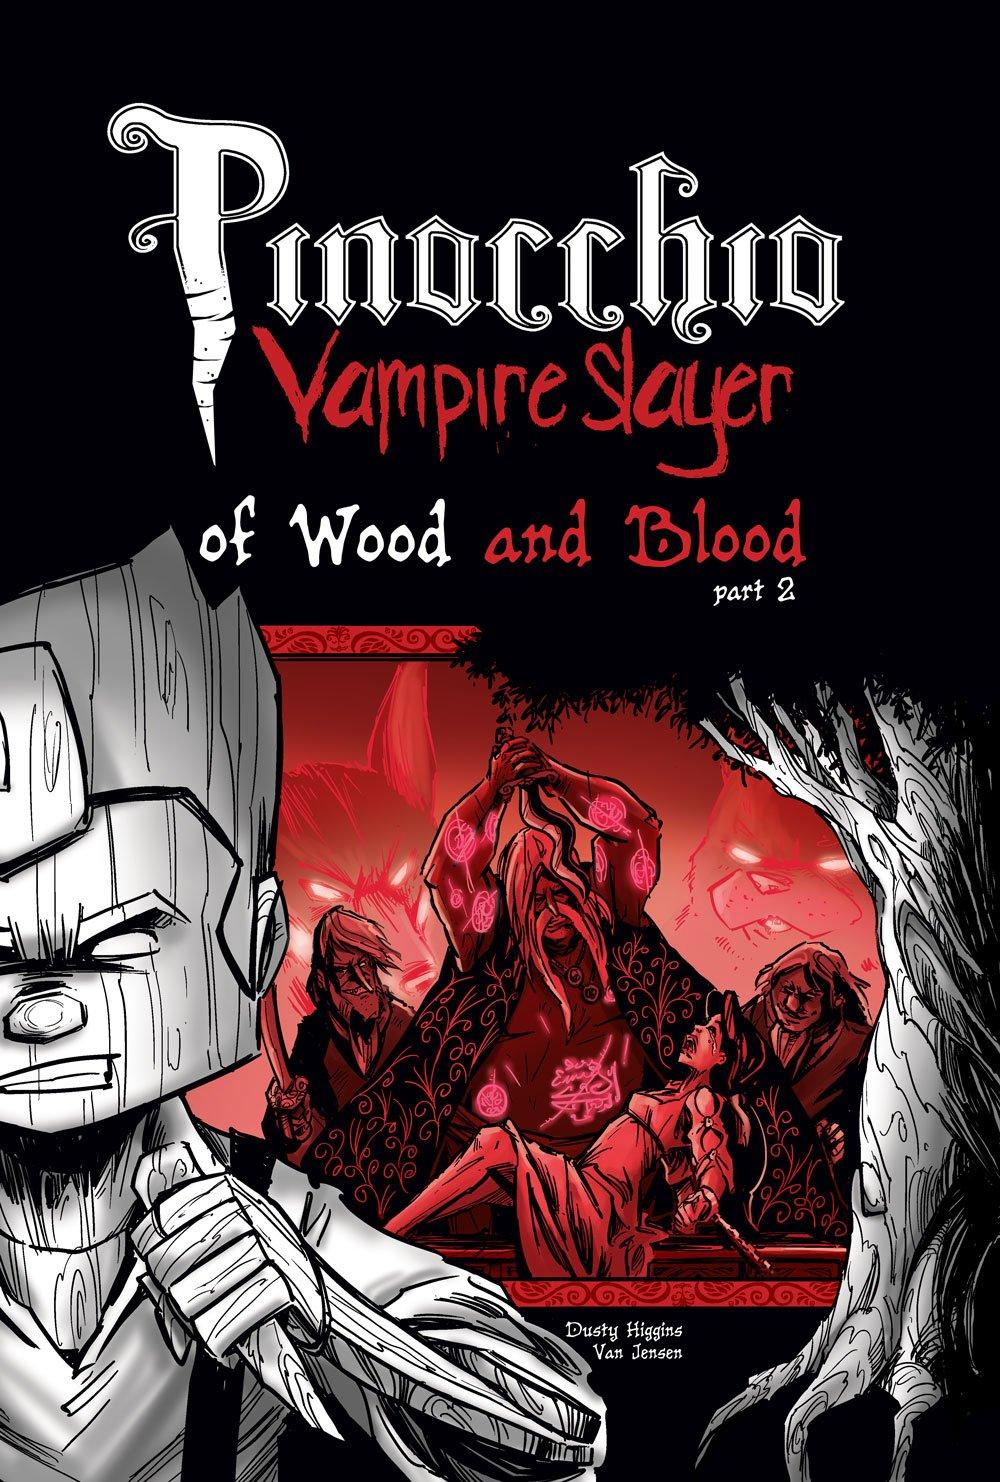 Pinocchio, Vampire Slayer Volume 3: Of Wood and Blood Part 2 by Van Jensen, Dusty Higgins